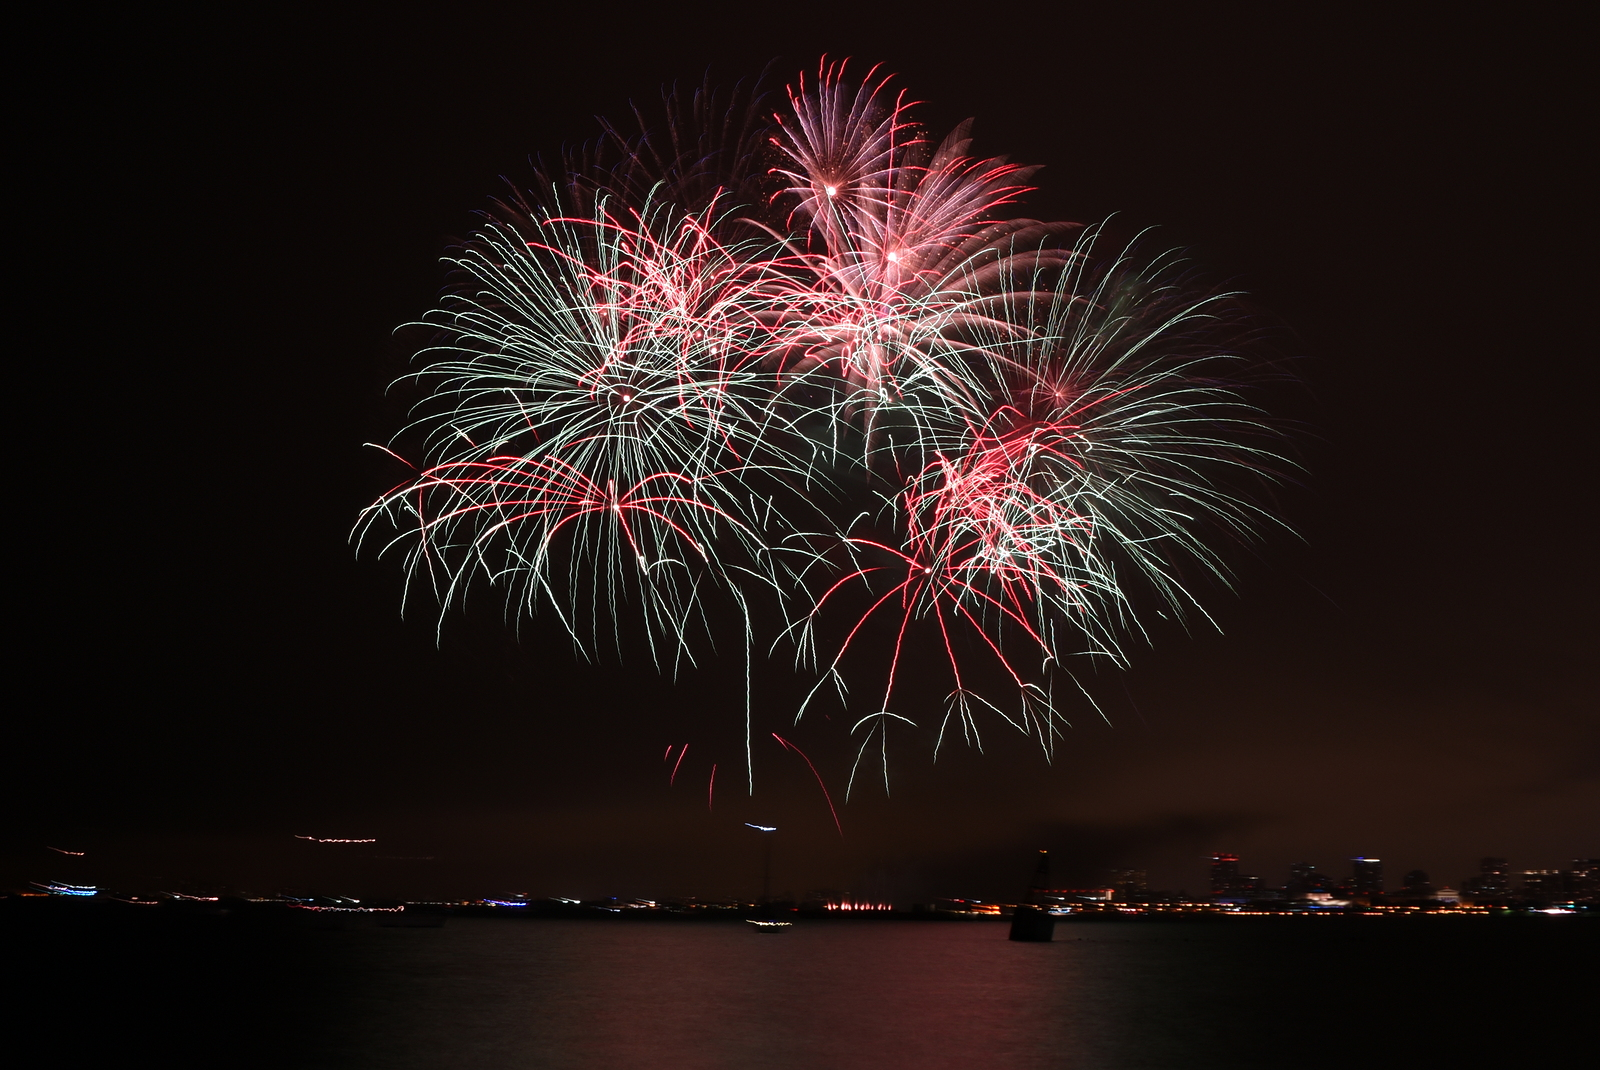 detroit fireworks, stathakis